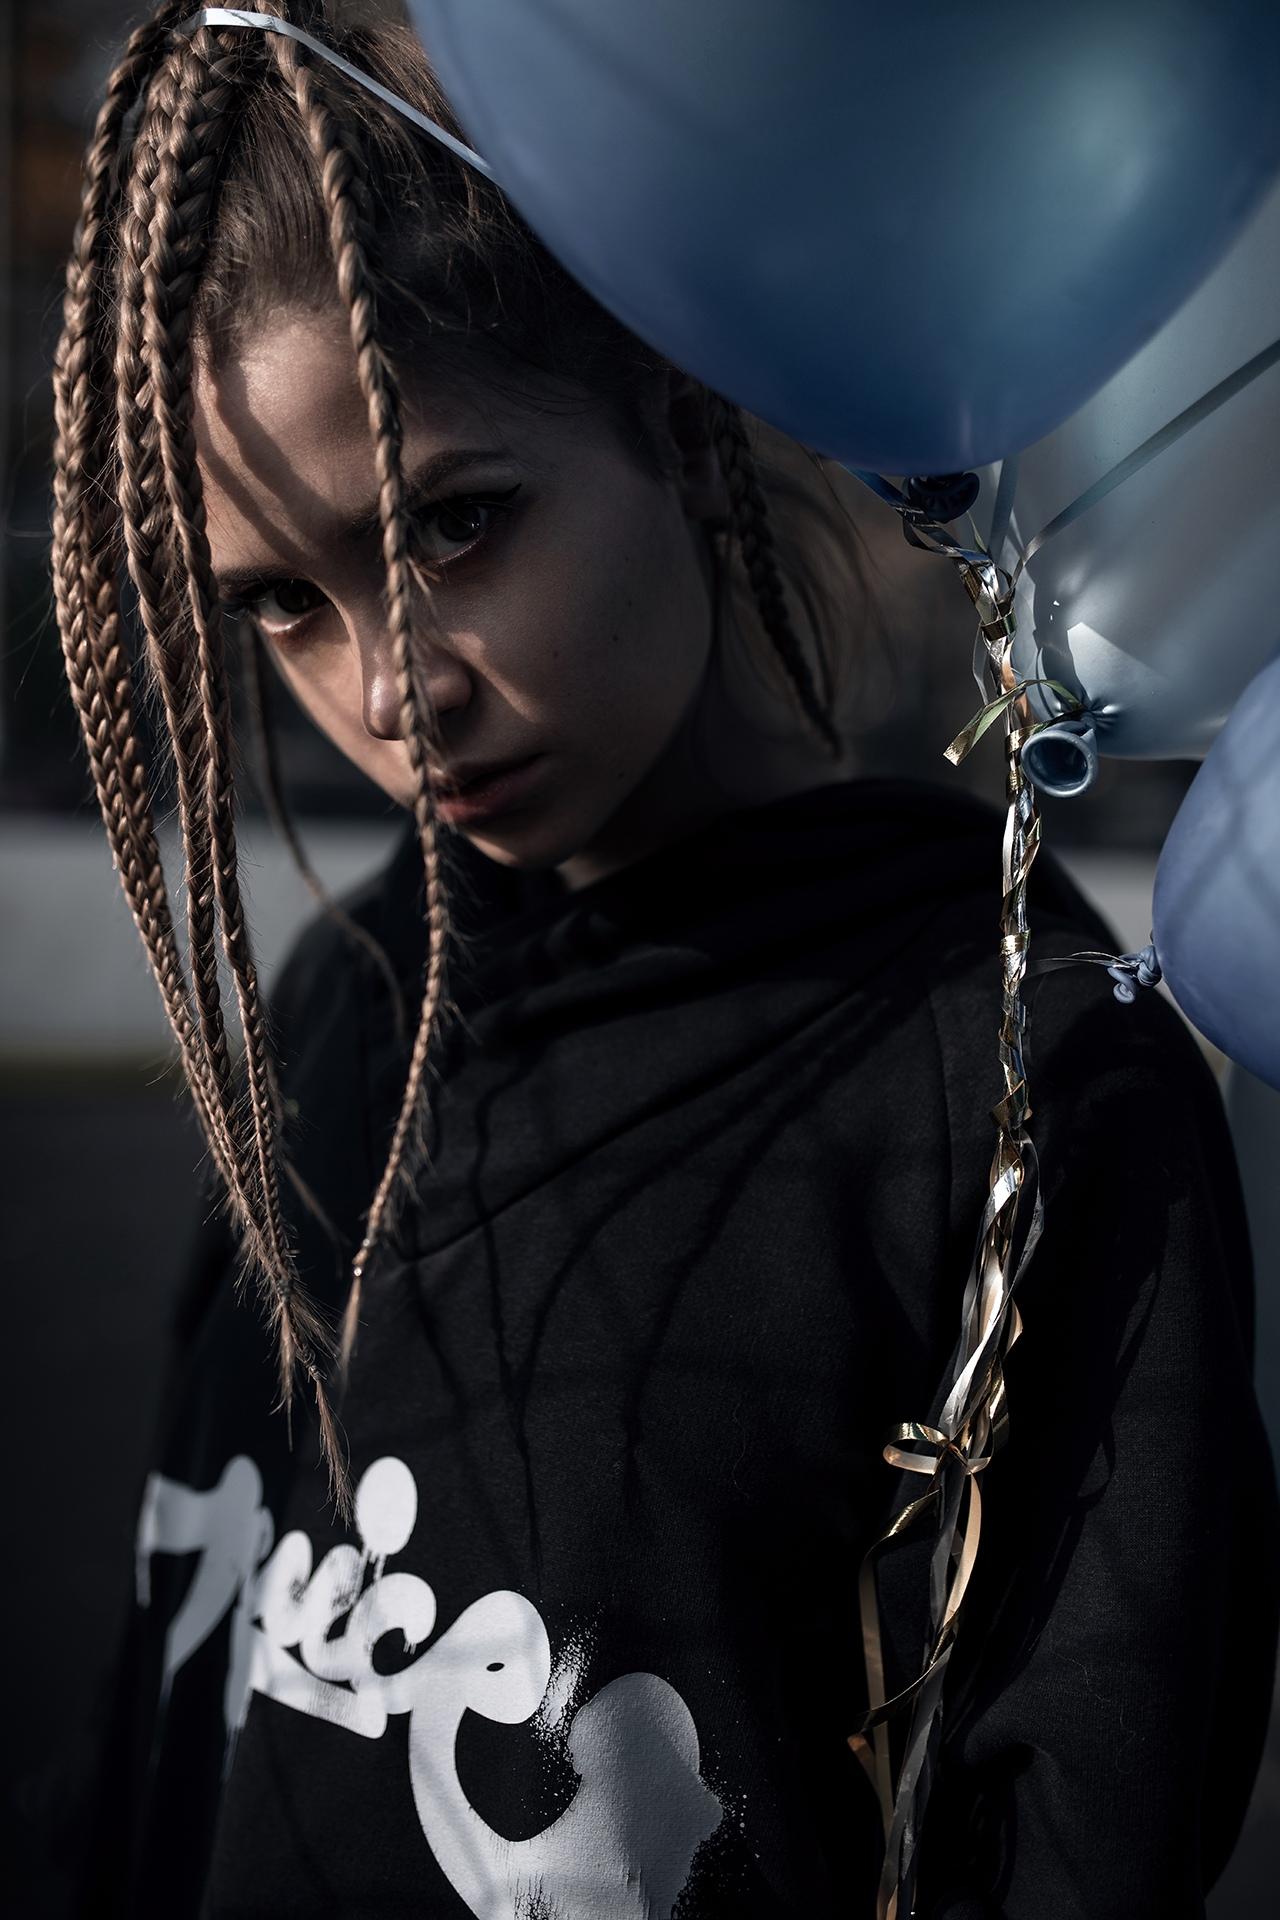 Yuriy Lyamin Women Ksenia Kokoreva Brunette Long Hair Braids Hoods Black Clothing Balloon Silver Out 1280x1920